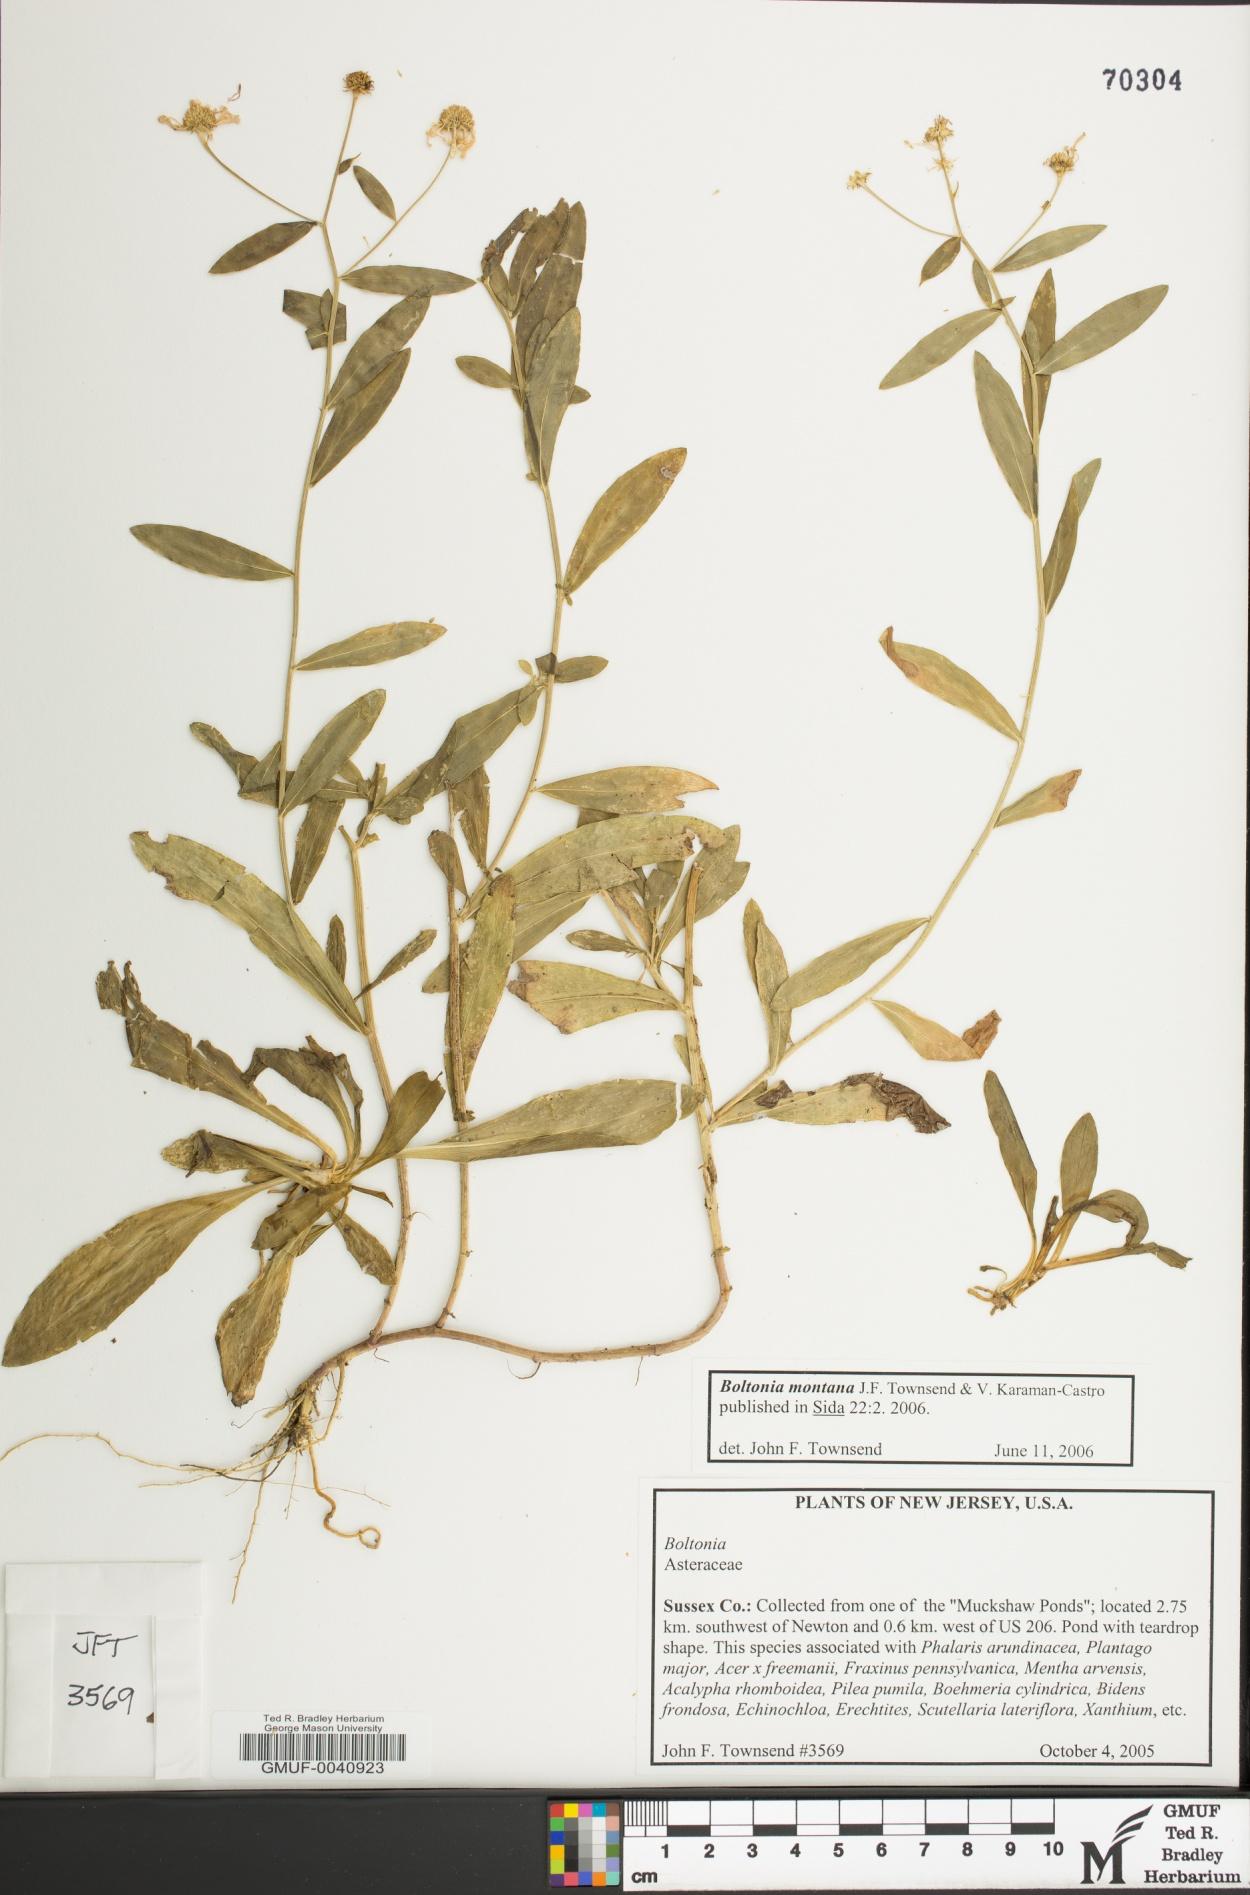 Boltonia montana image